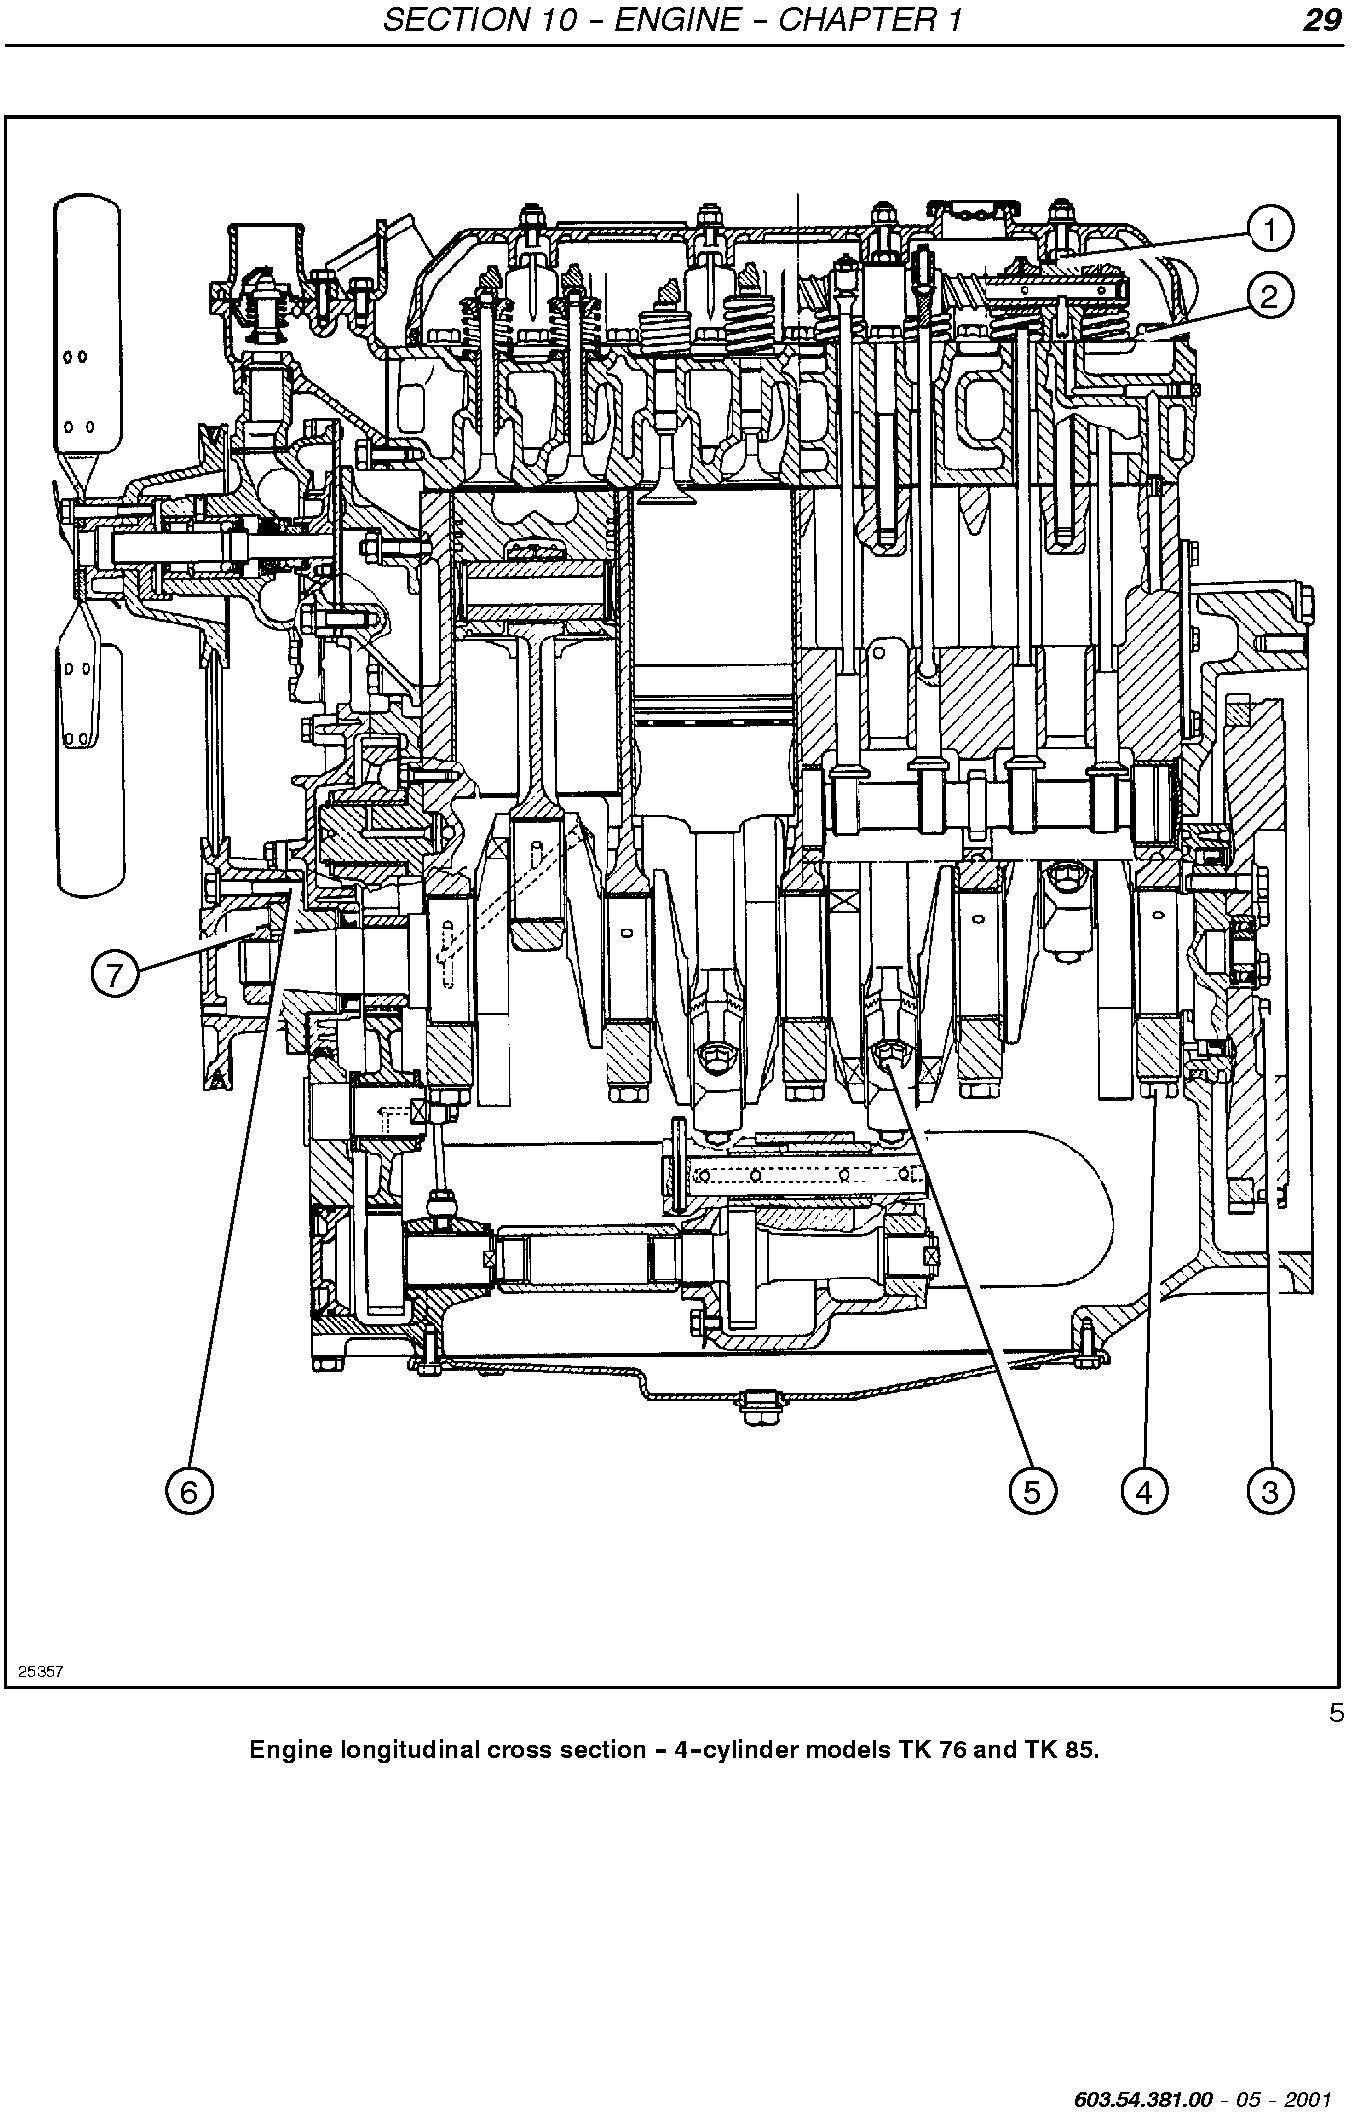 New Holland TK65, TK75(A),TK76, TK85,TK95, TK70A,TK80A, TK90A, TK100A Crawler Tractor Service Manual - 1